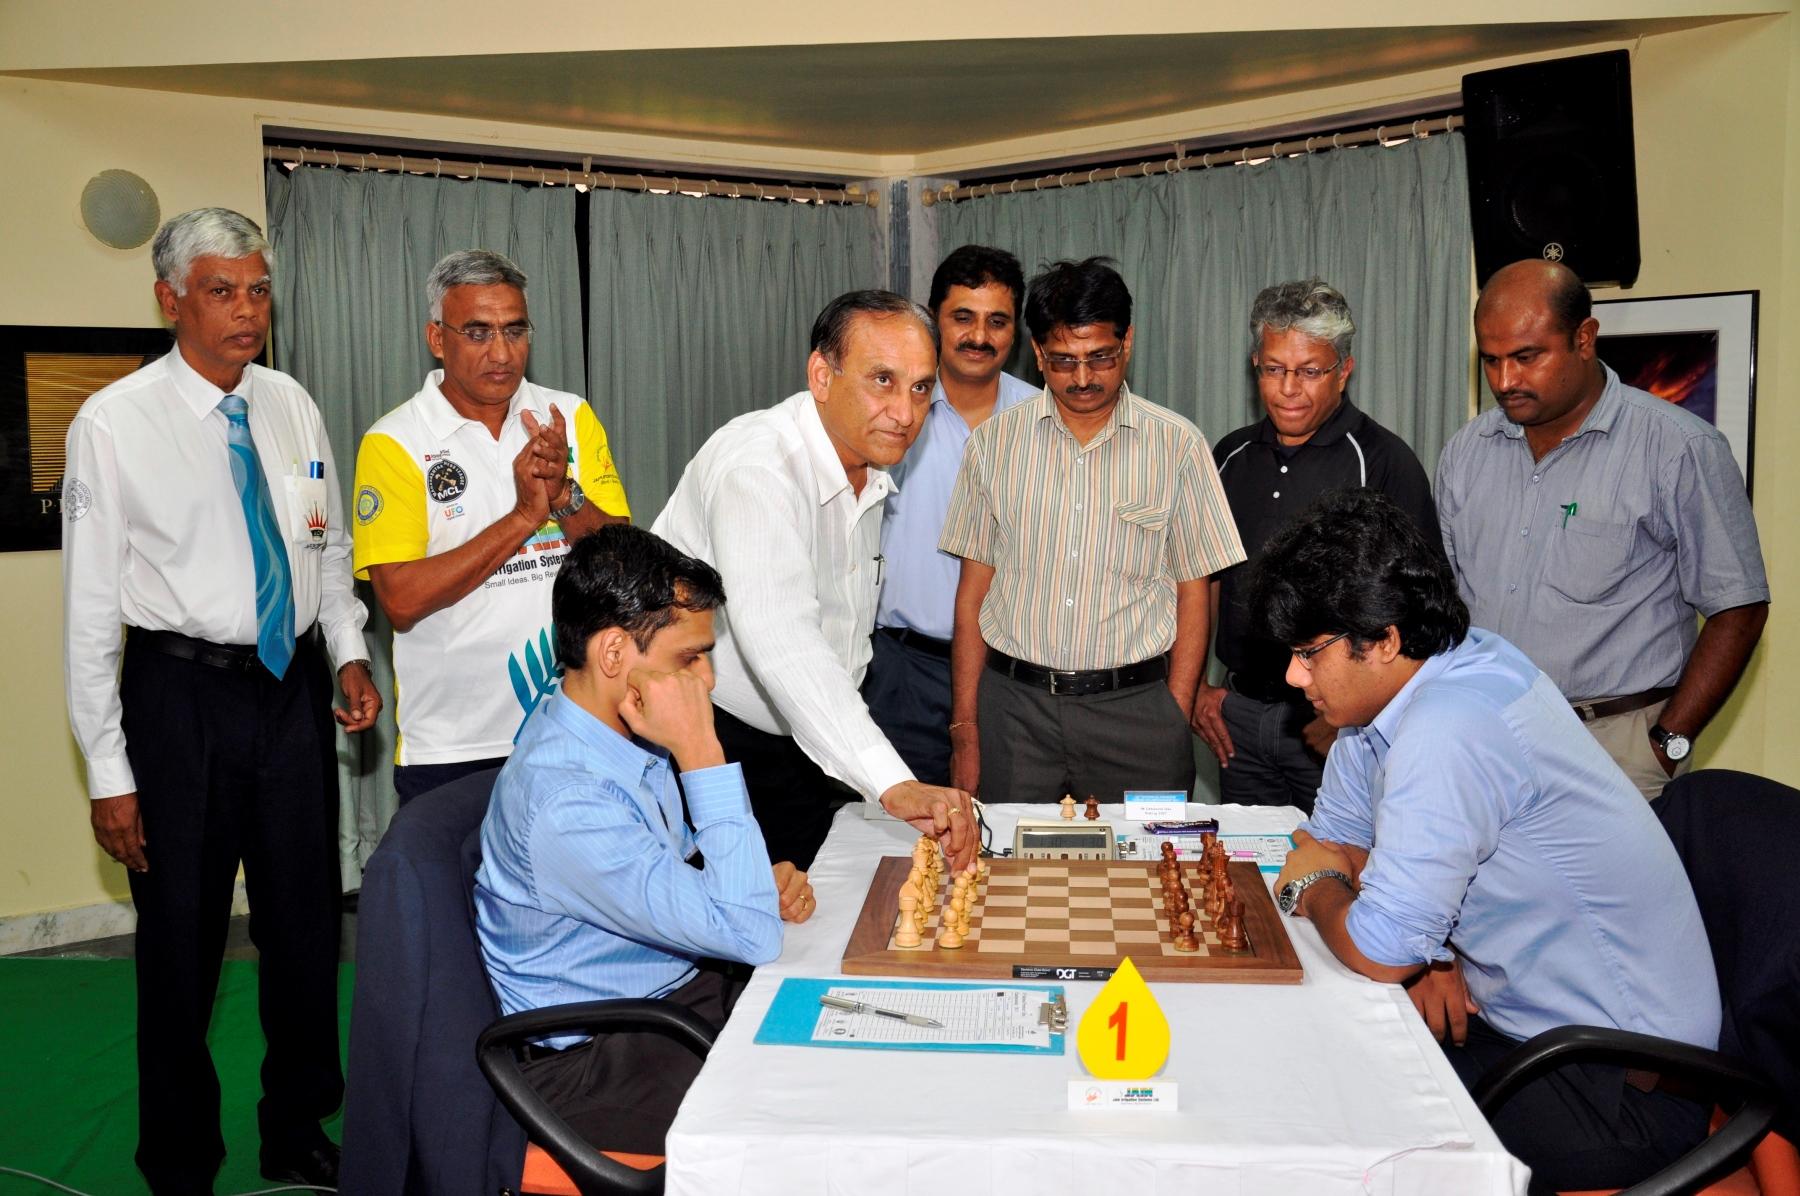 Chief guest Mr. Ramesh Jain inaugurating the seventh round game between GM K Sasikiran and IM Debashis Das. At the extreme left is chief arbiter Prof. R. Anantharam and next to him is organising secretary Faruk Shaik